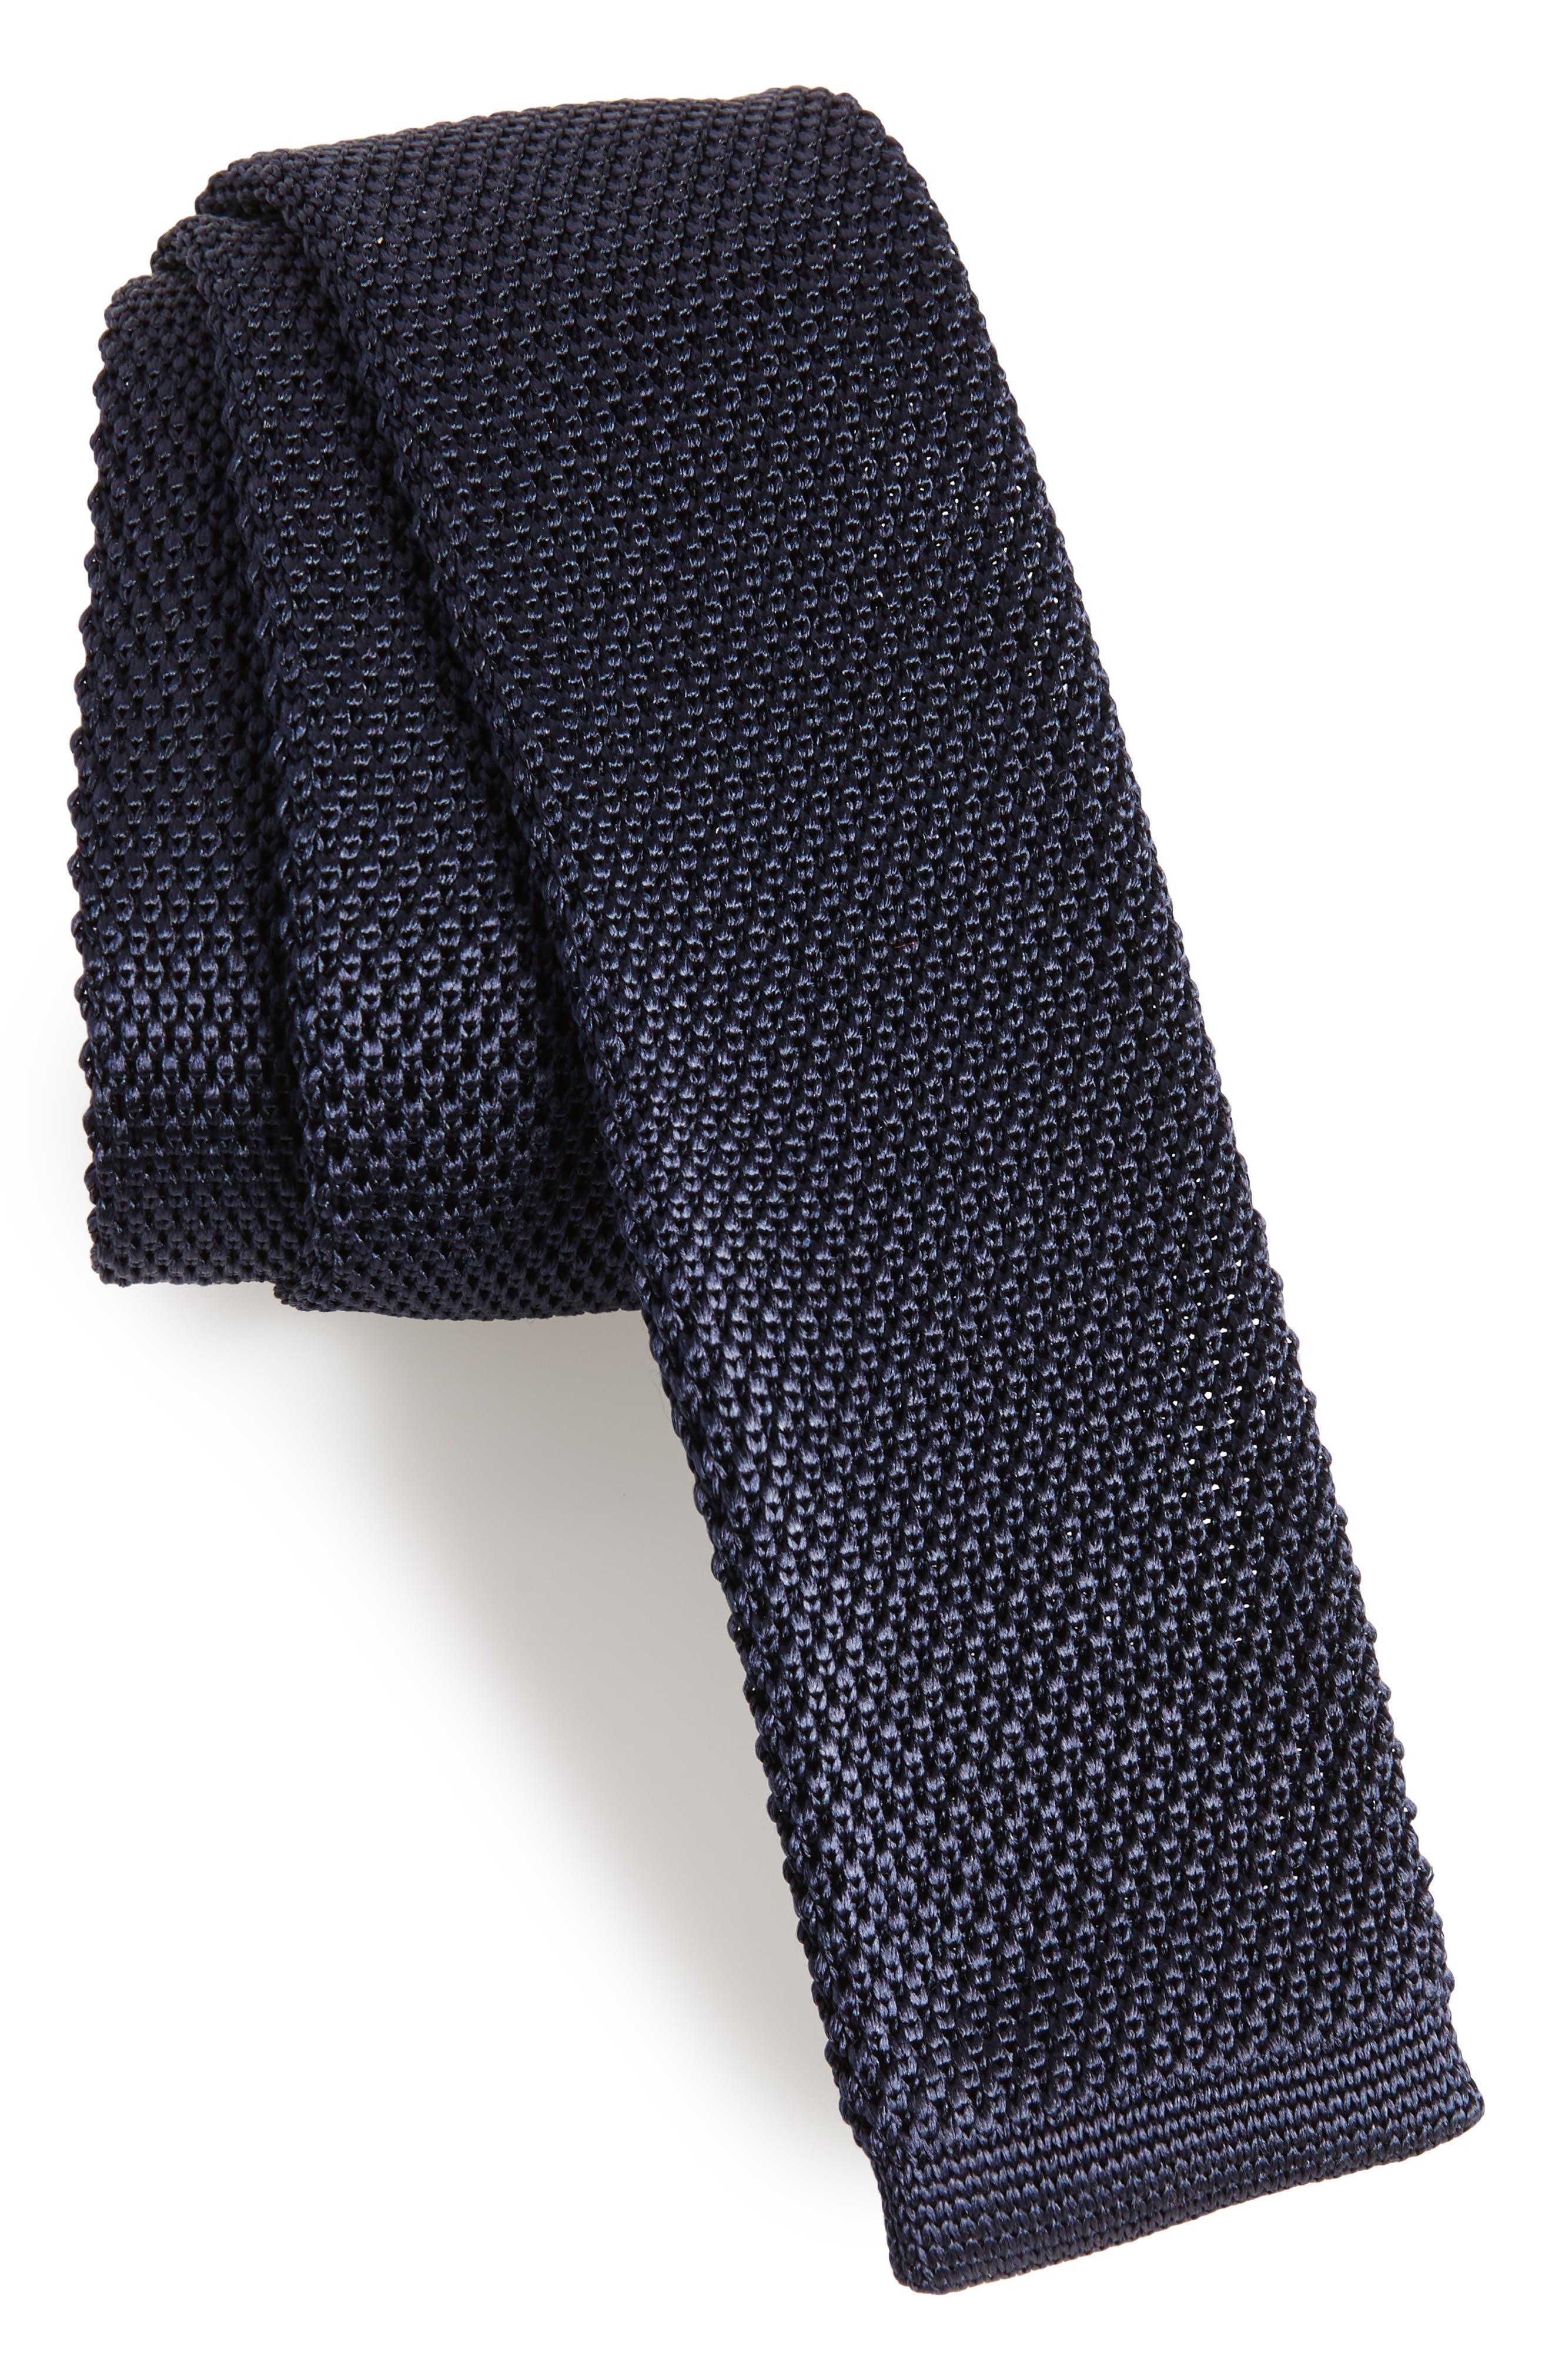 Solid Knit Silk Skinny Tie,                         Main,                         color, Navy